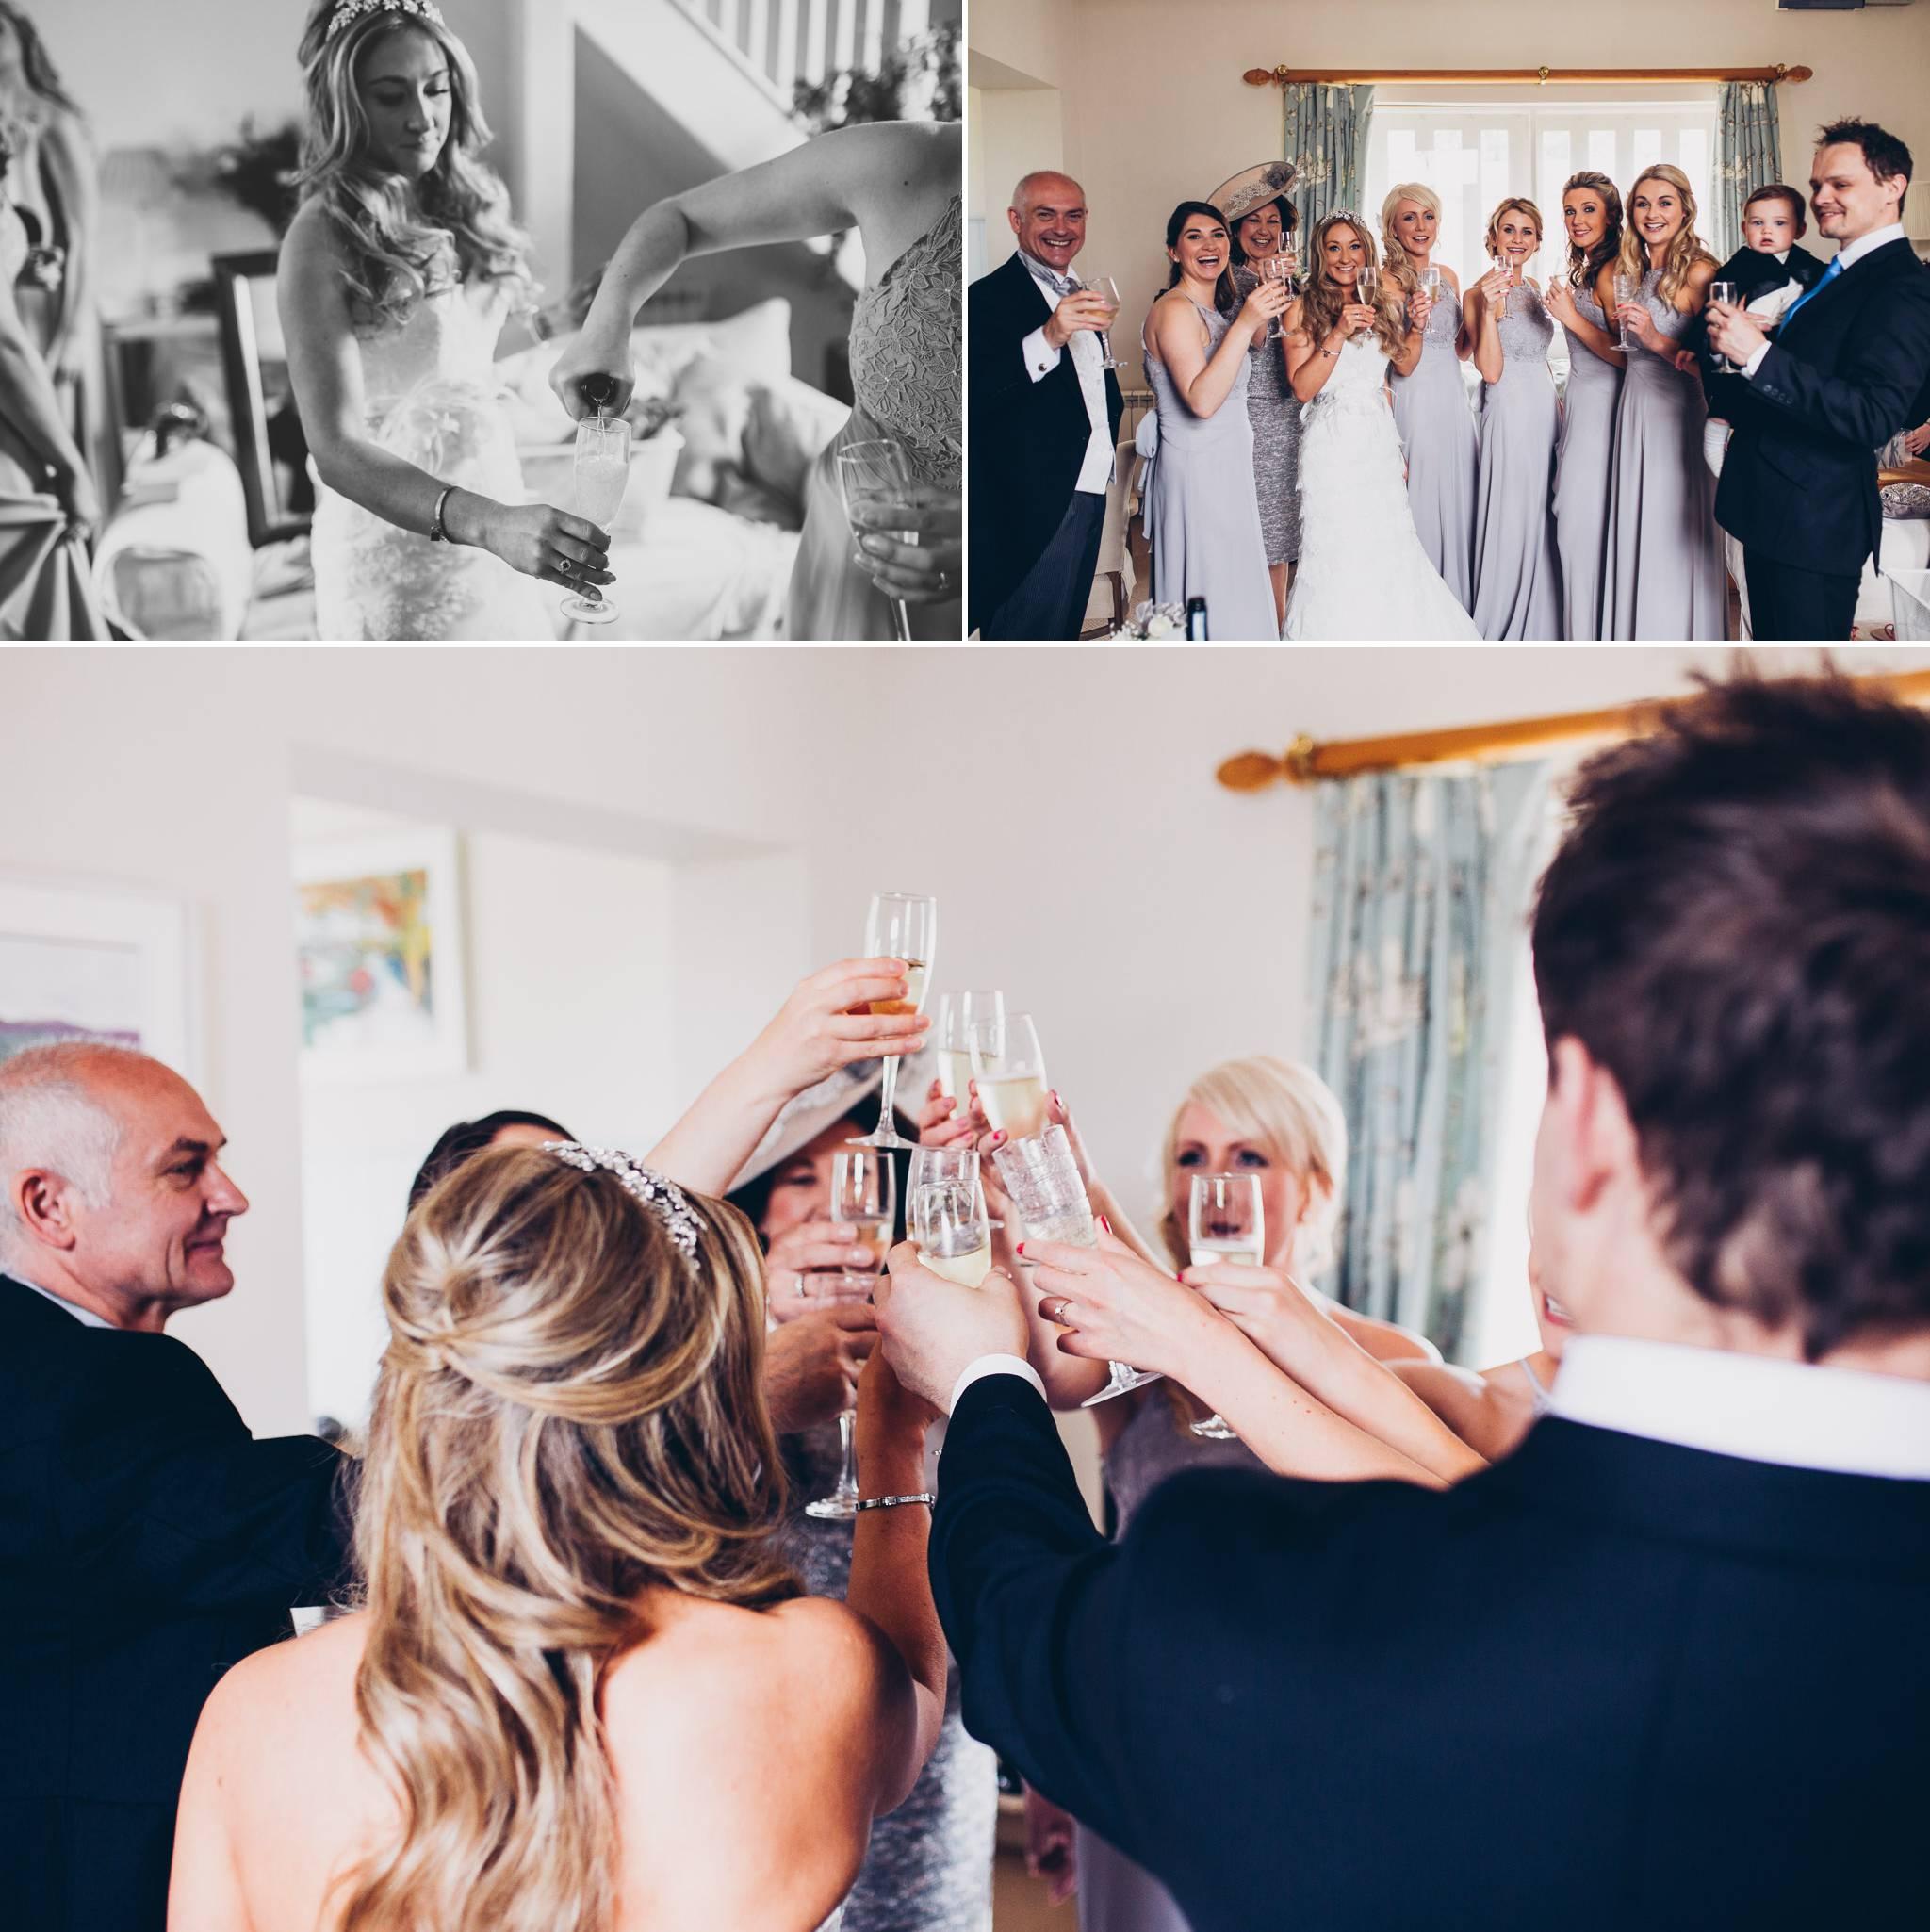 shropshire-wedding-photography 6.jpg